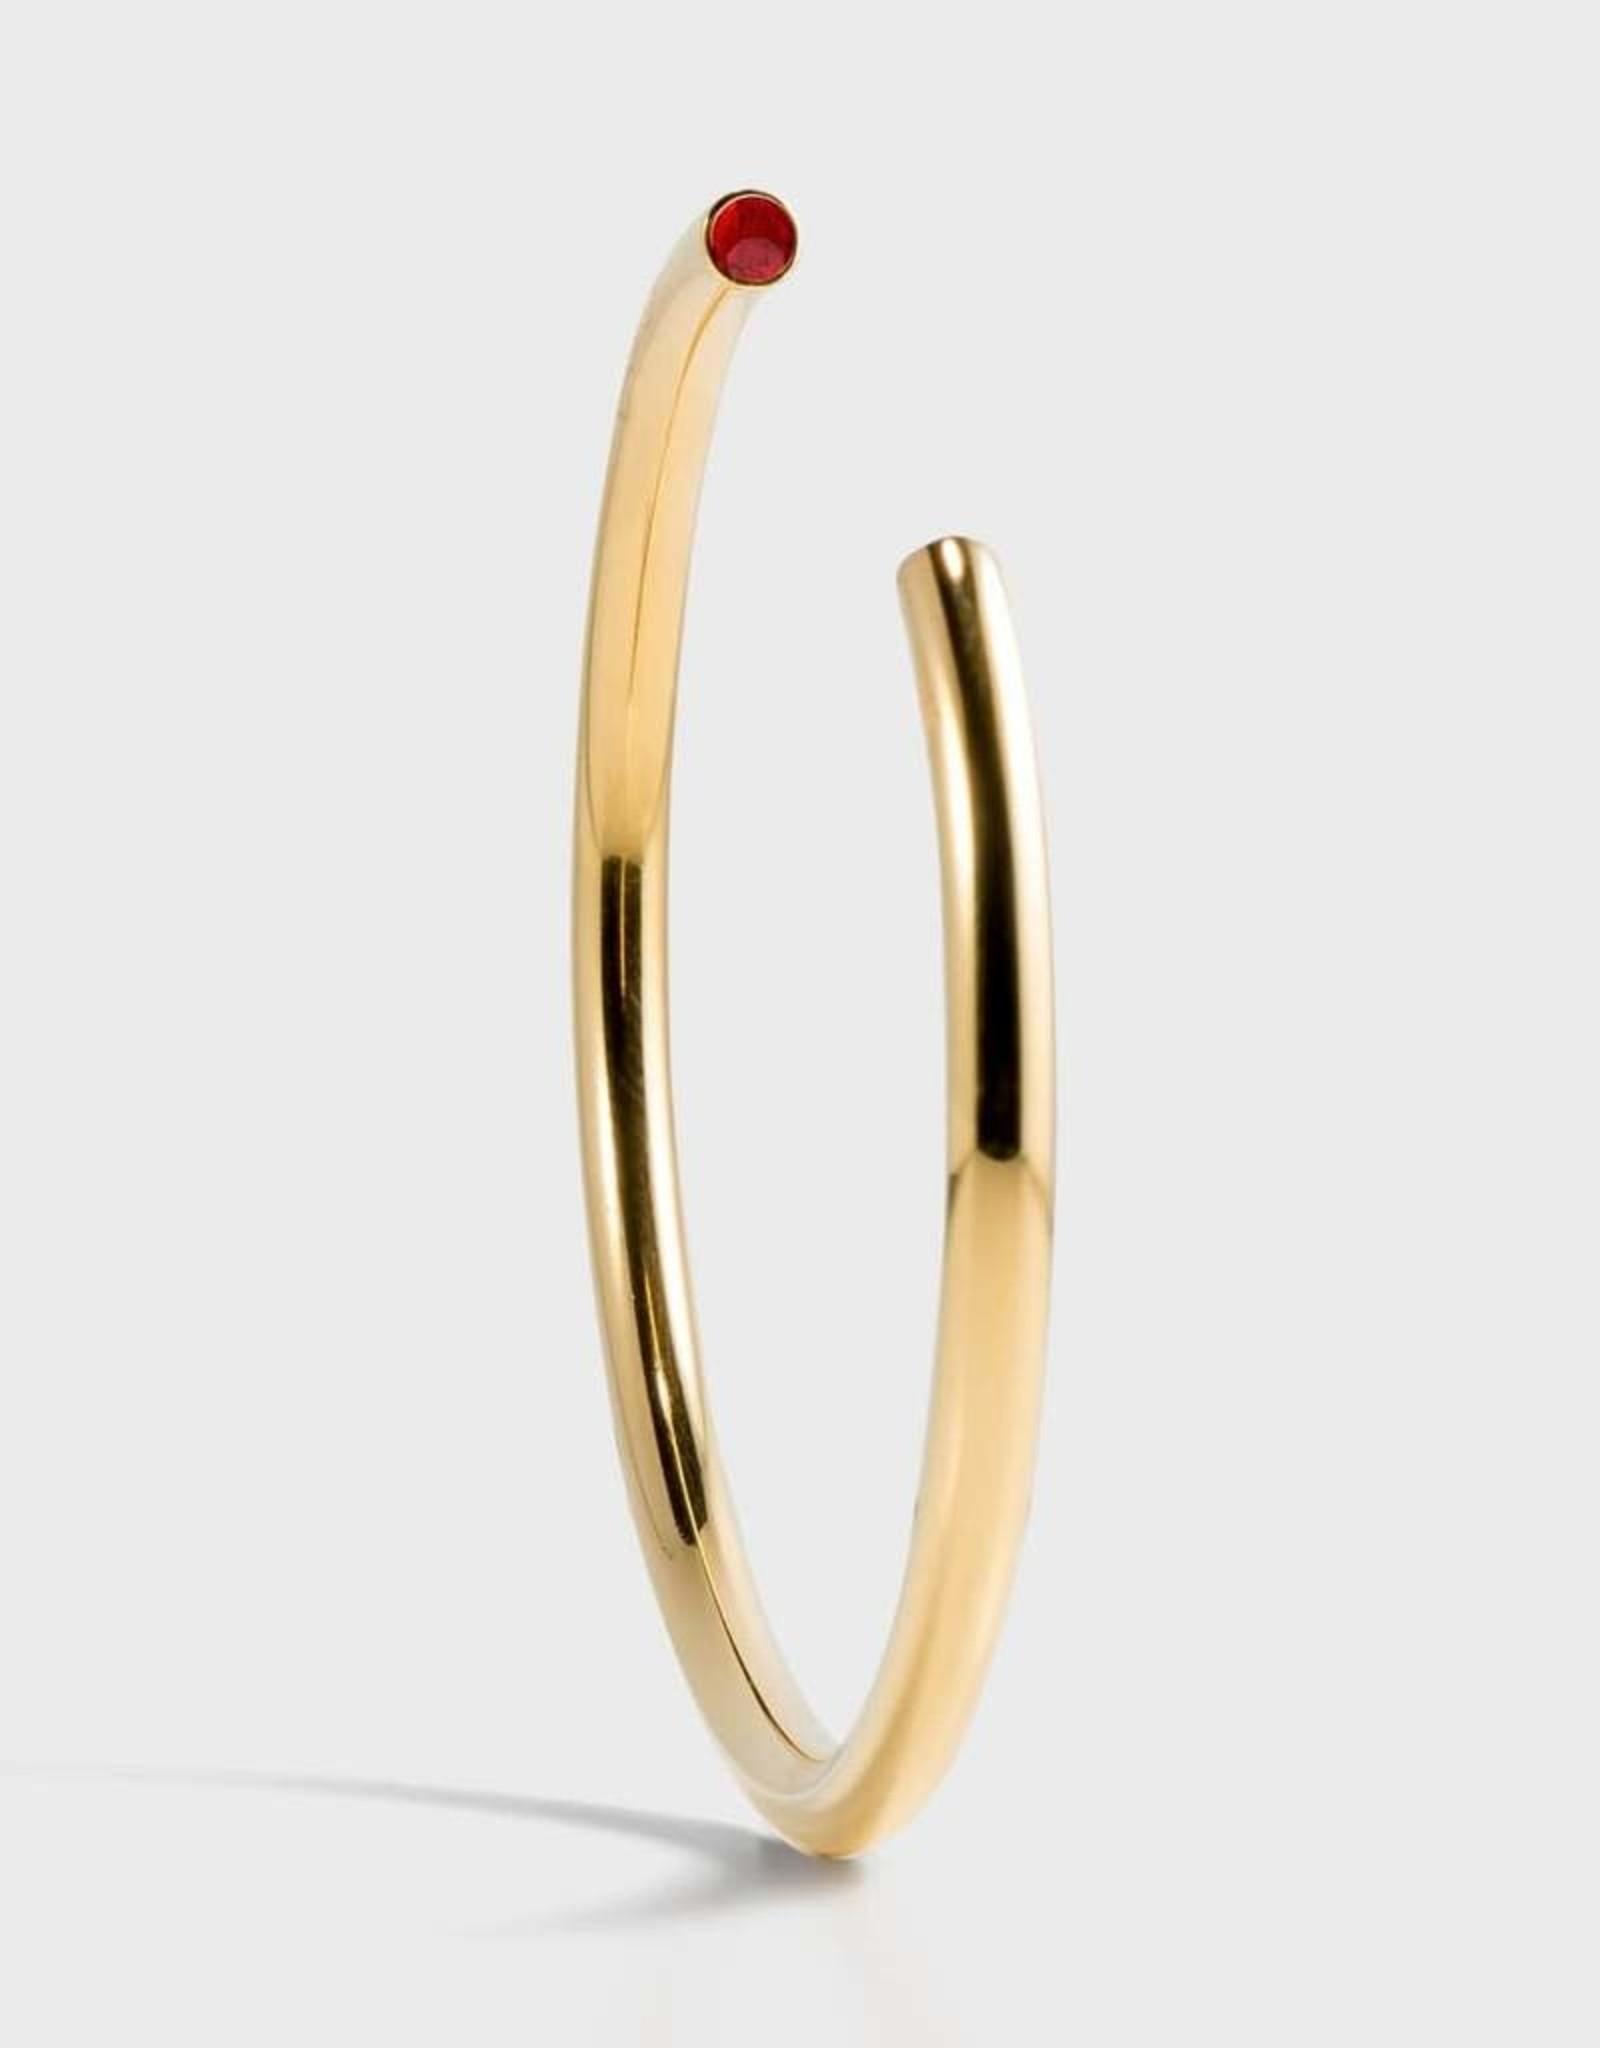 Stella Vale Birthstone Bracelet - July/Gold